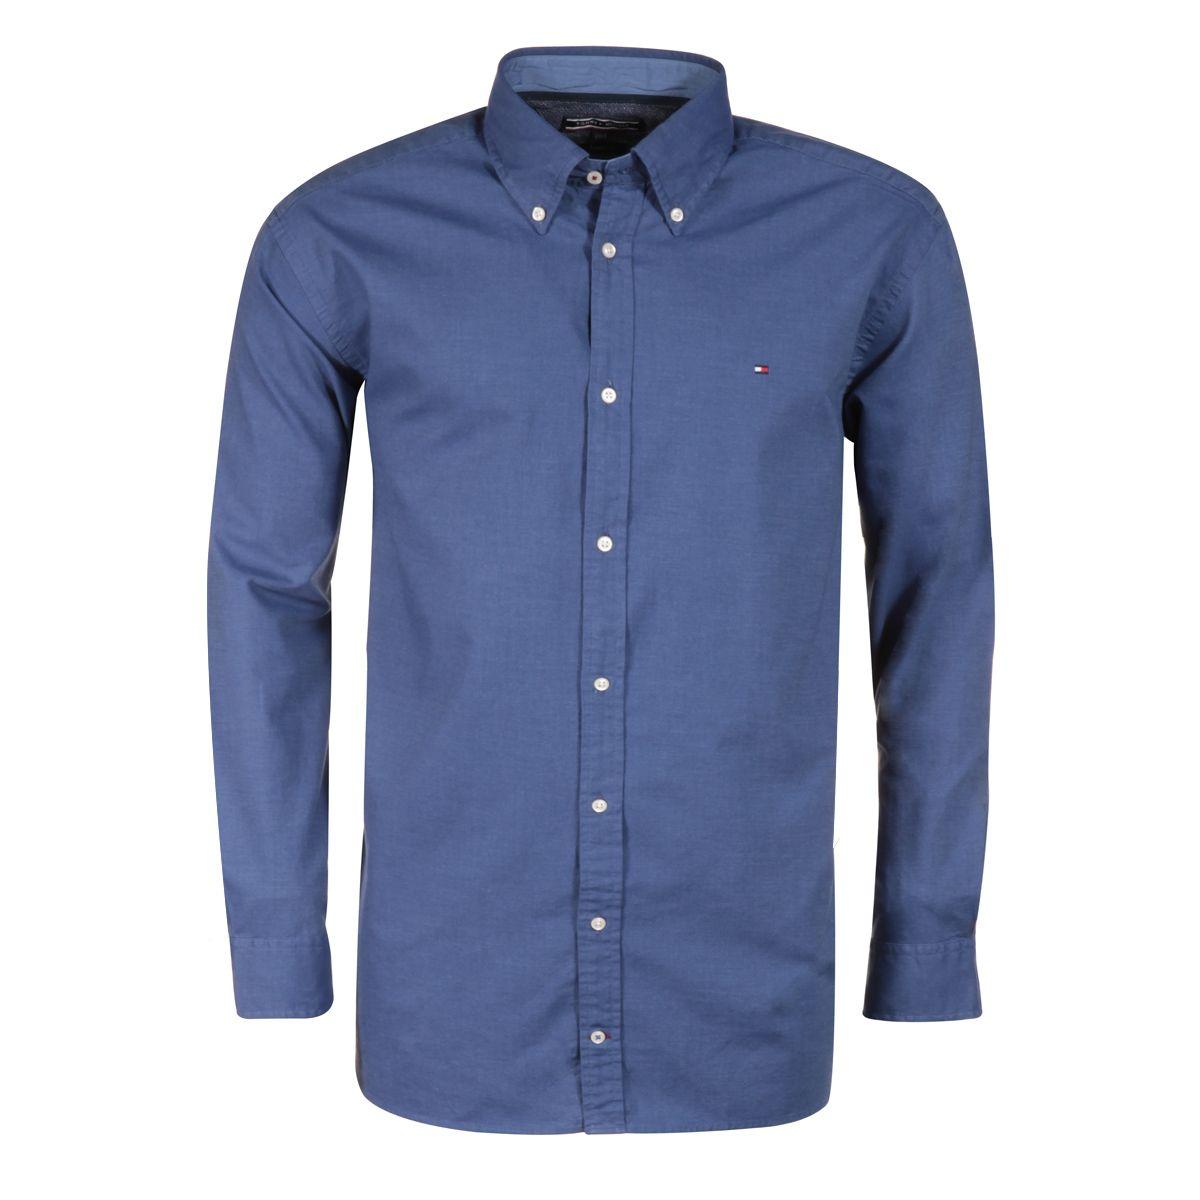 chemise bleue grande taille du 2xl au 5xl size factory tommy hilfiger. Black Bedroom Furniture Sets. Home Design Ideas